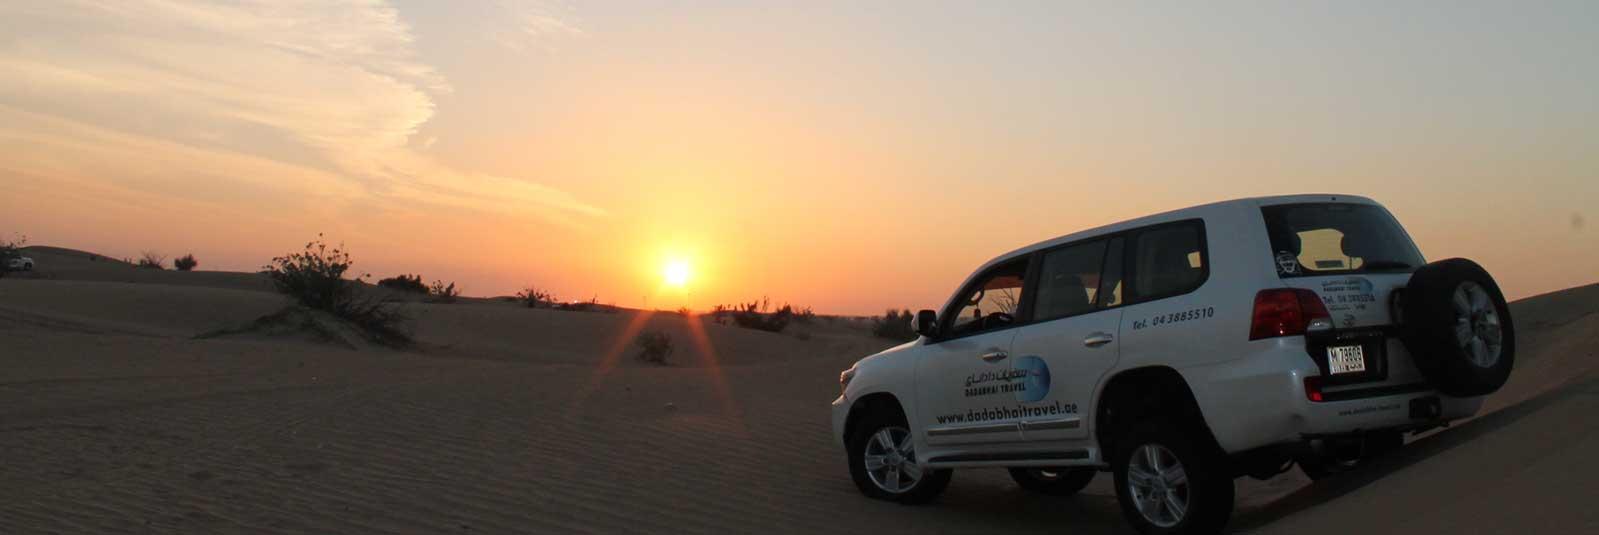 sunset-desert-safari